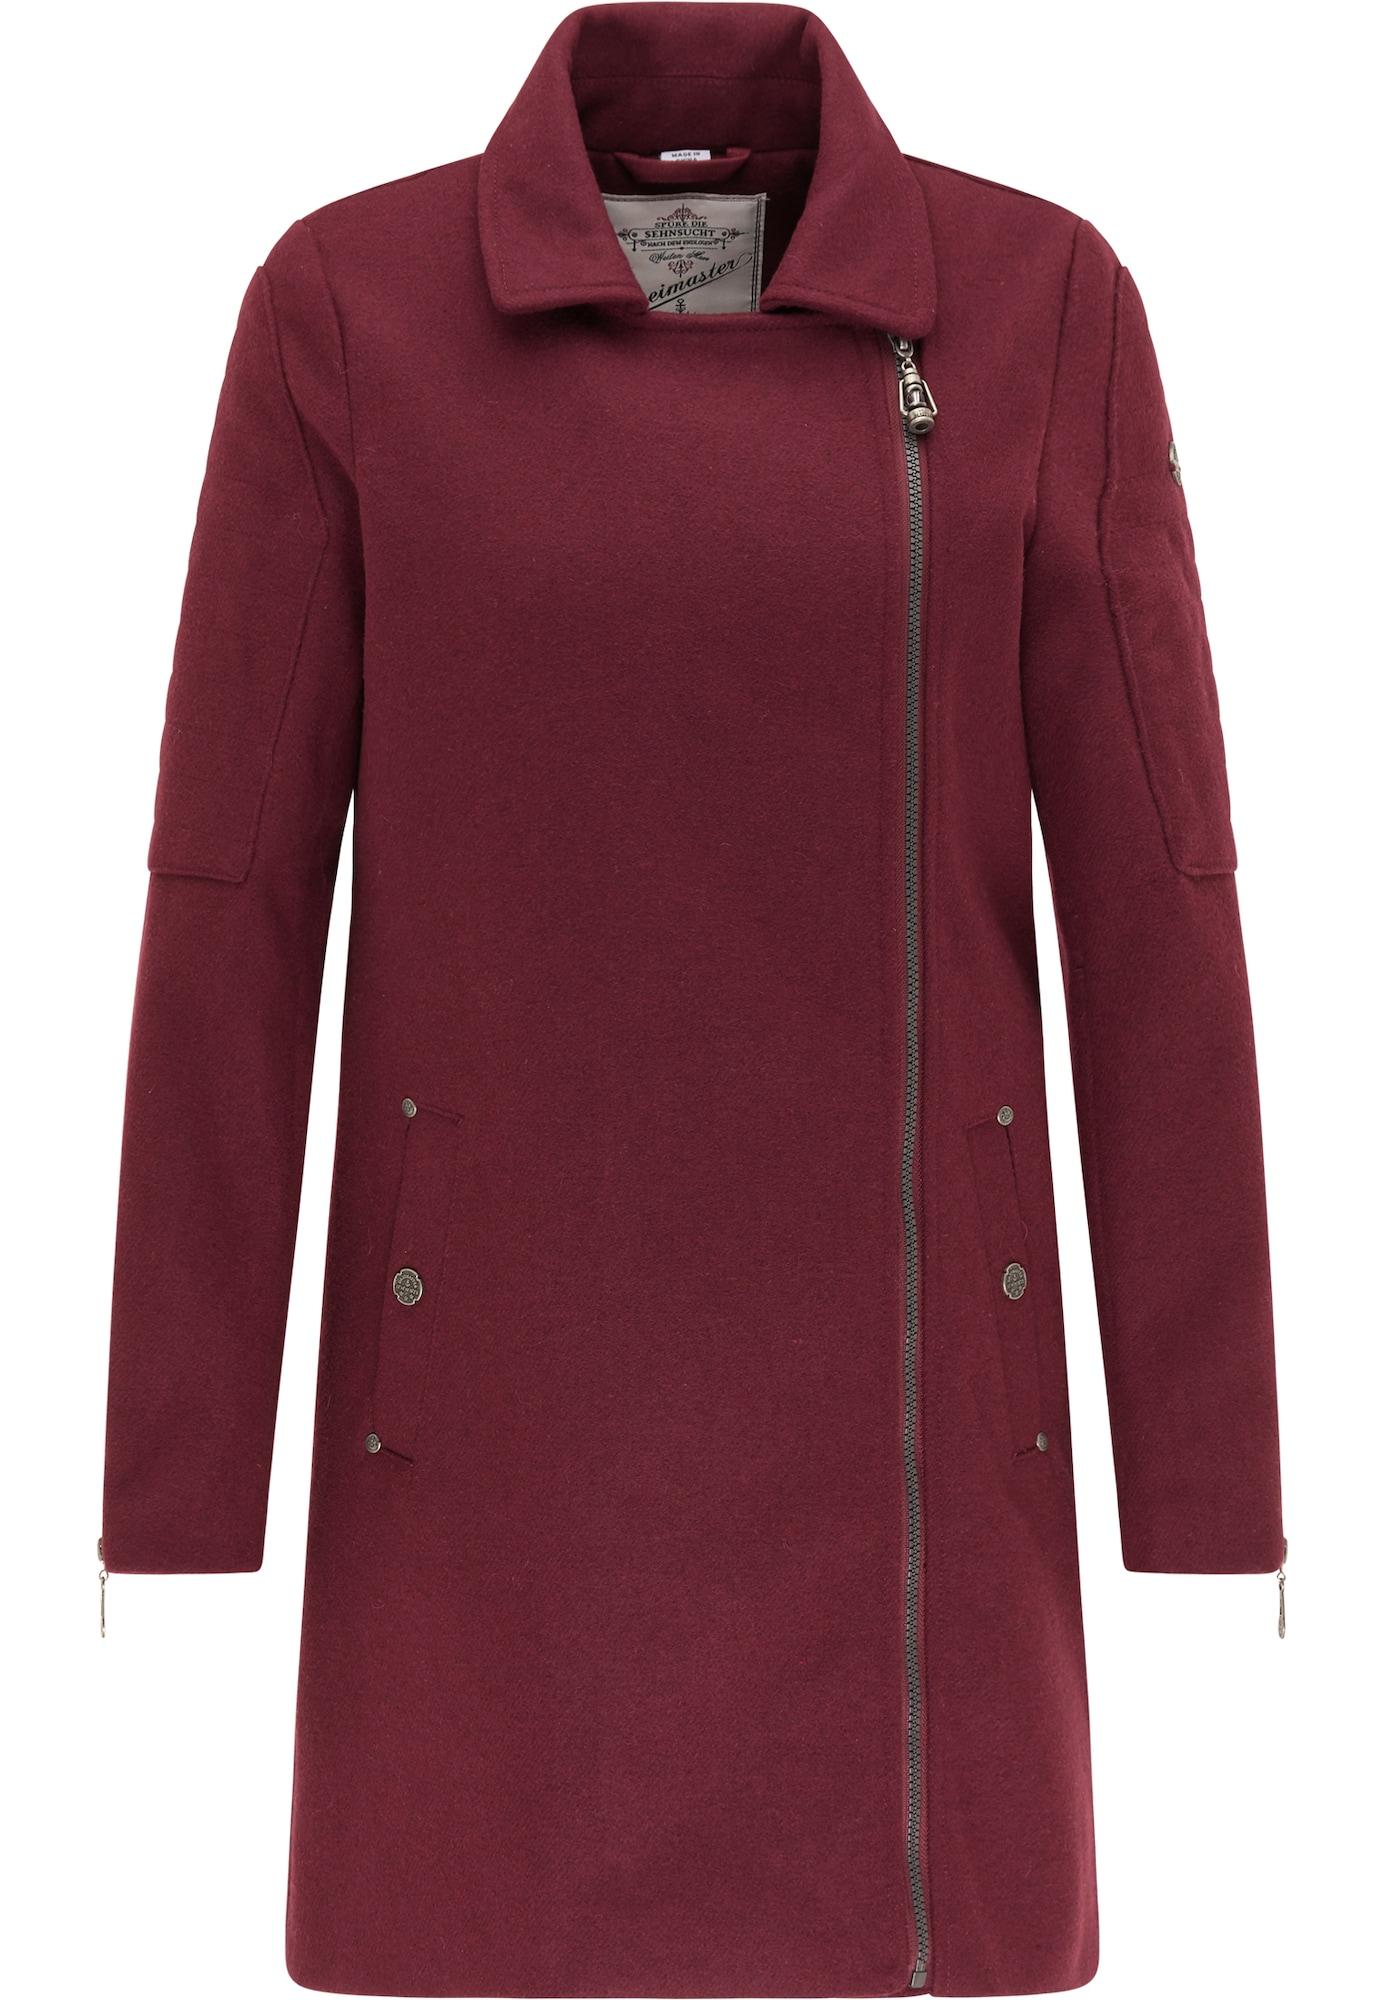 DreiMaster Vintage Demisezoninis paltas kraujo spalva